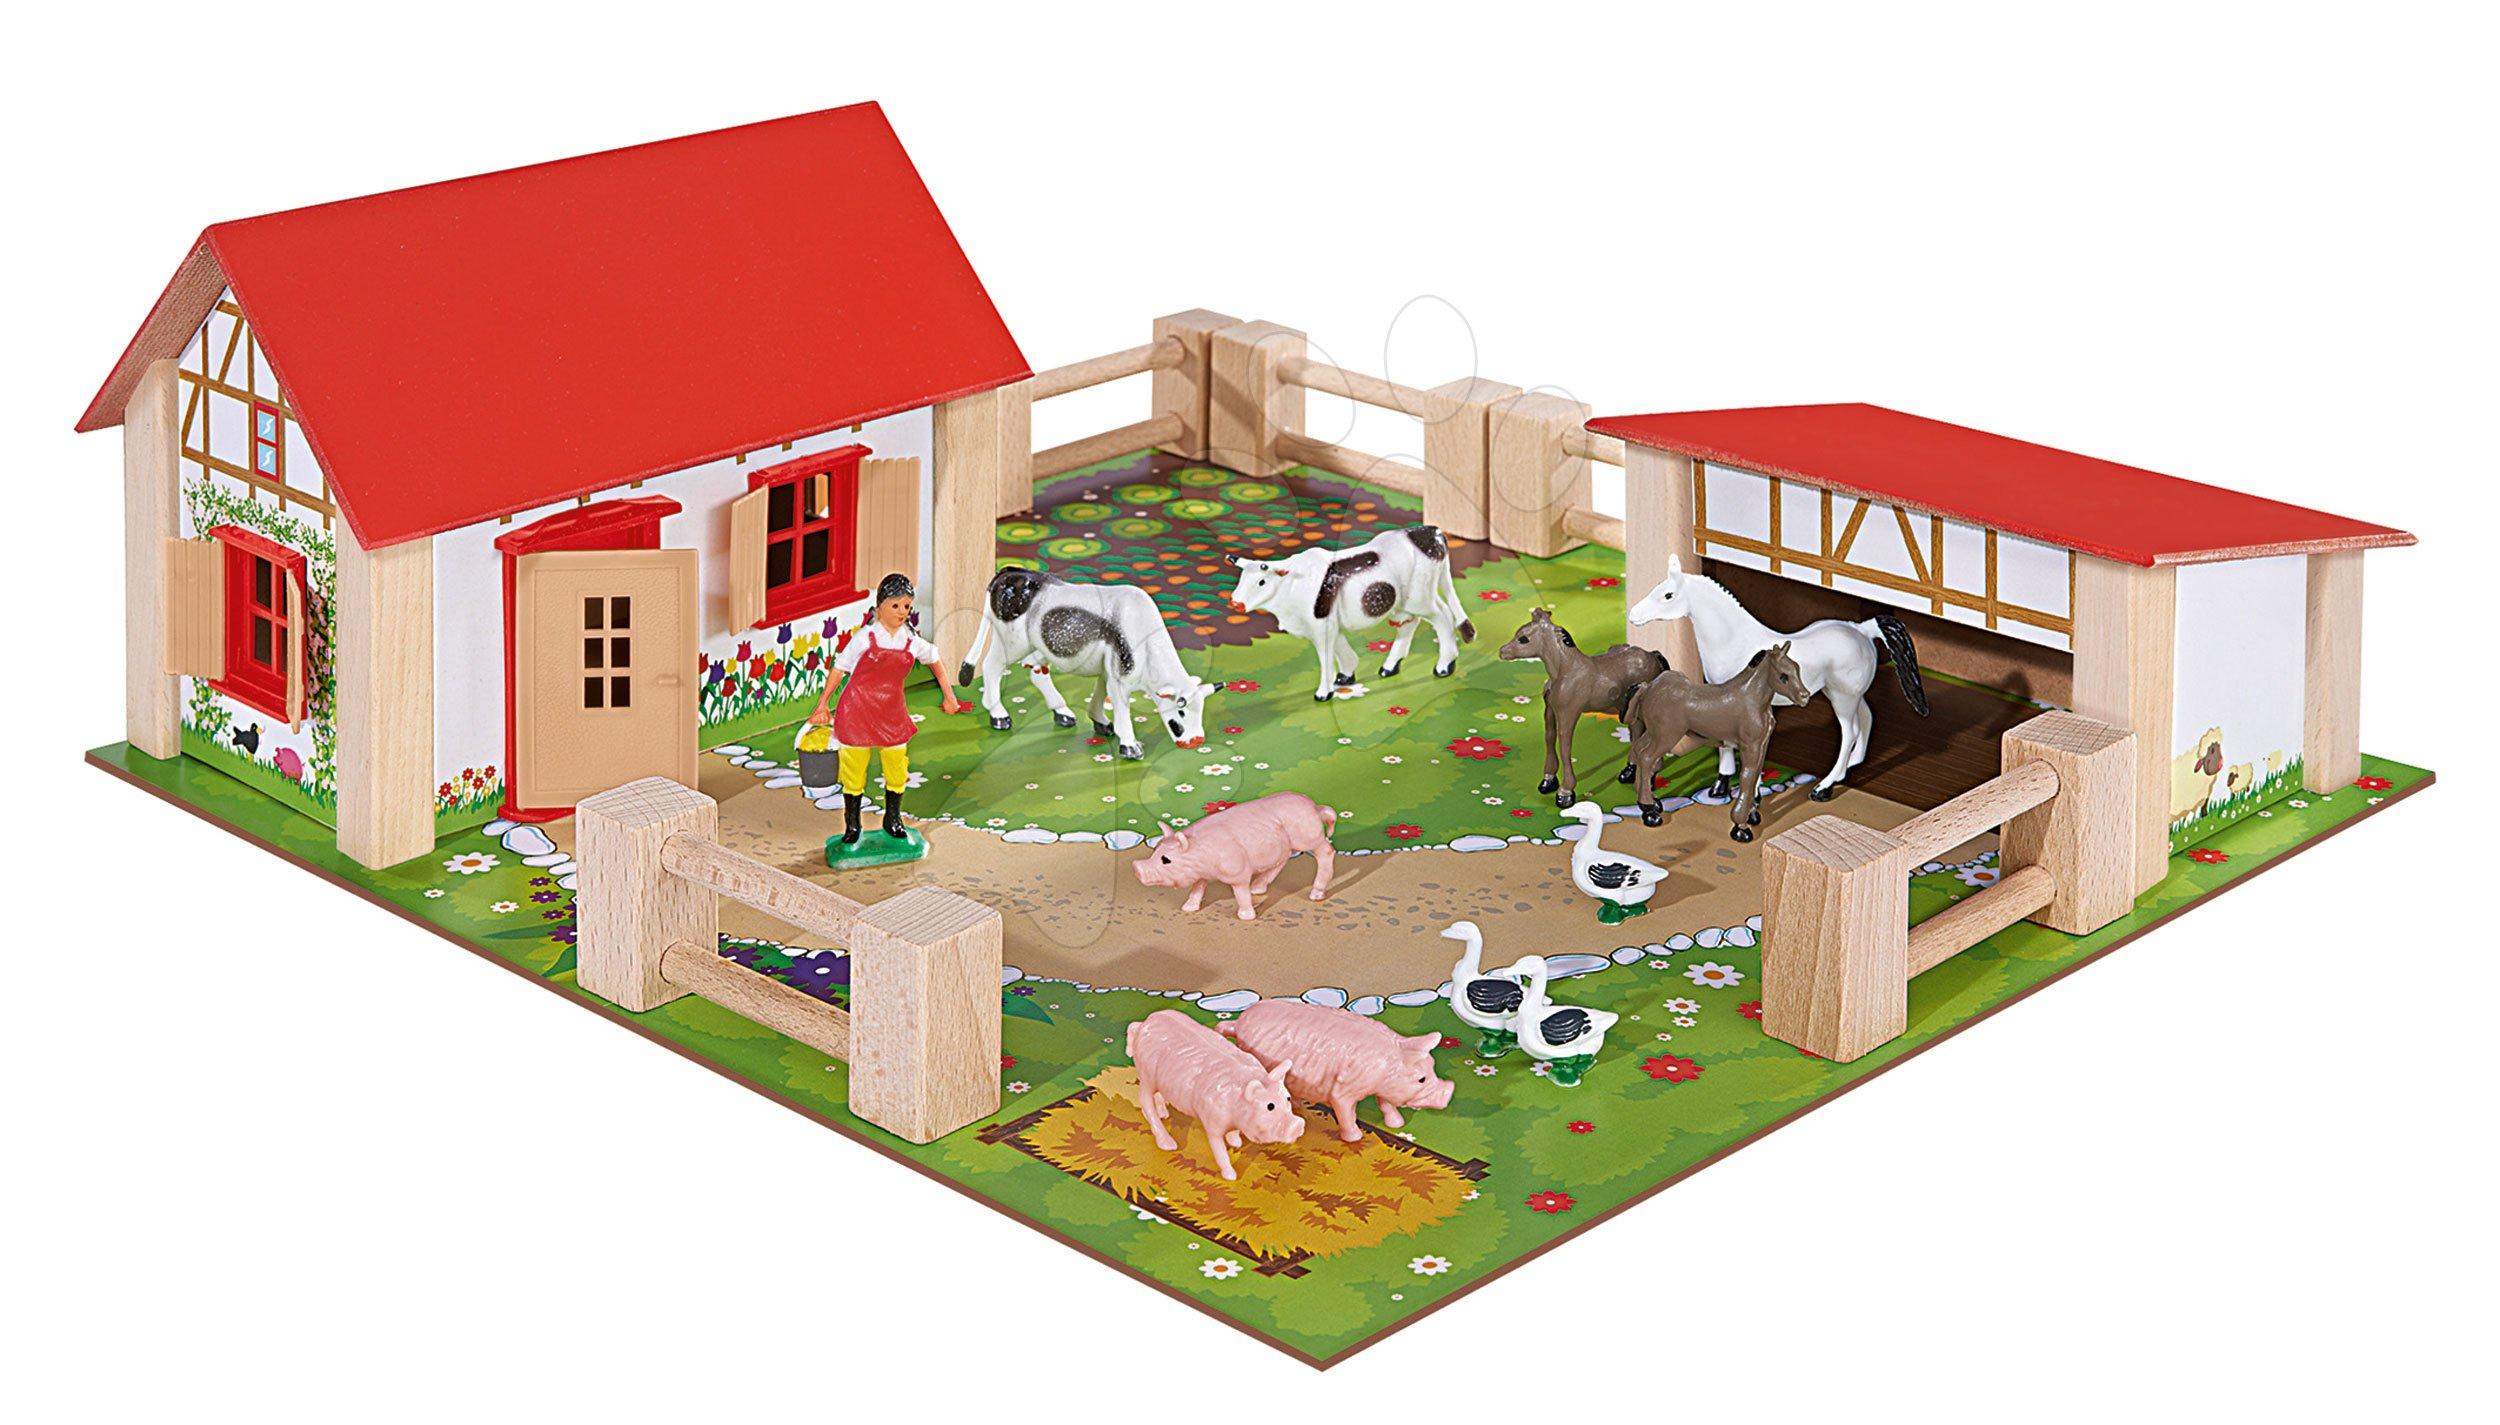 Dřevěná farma se zvířátky Farmyard Small Eichhorn se dvěma budovami a dvorem 21 dílů